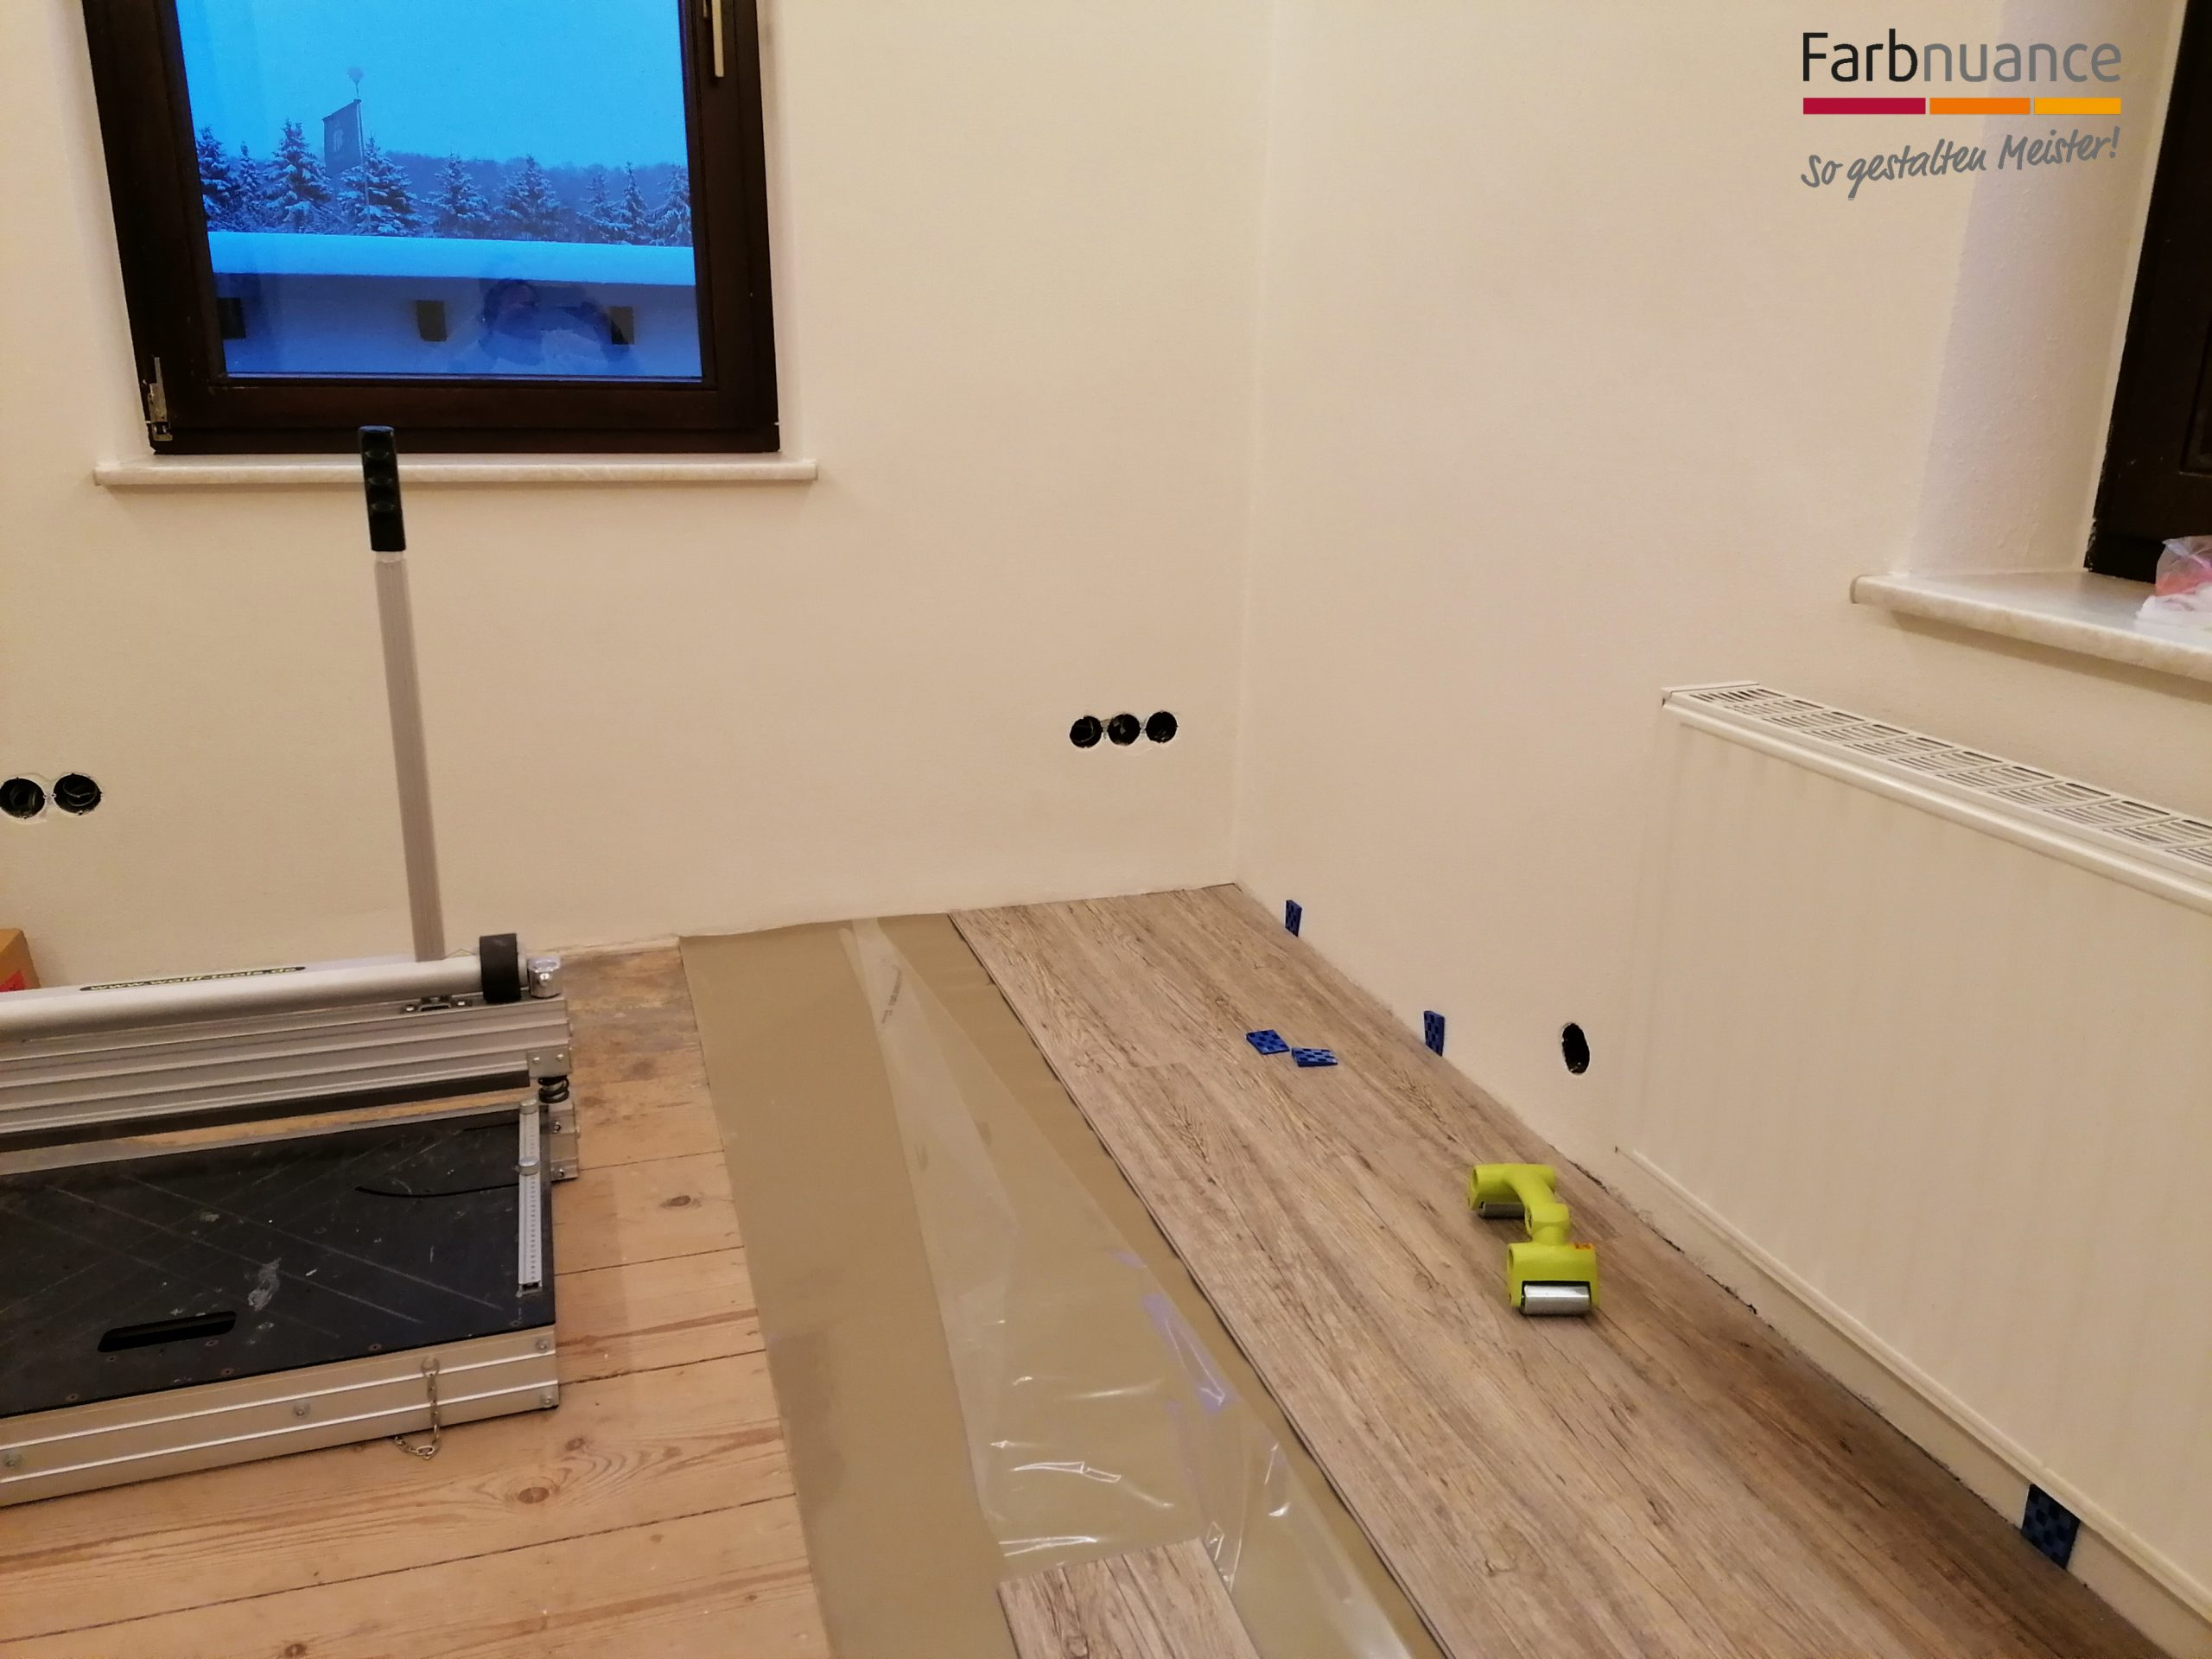 Farbnuance,Maler, Malerfirma,Fußboden,Vinyl,Pirna,Jessen,Vinylfußboden, (3)